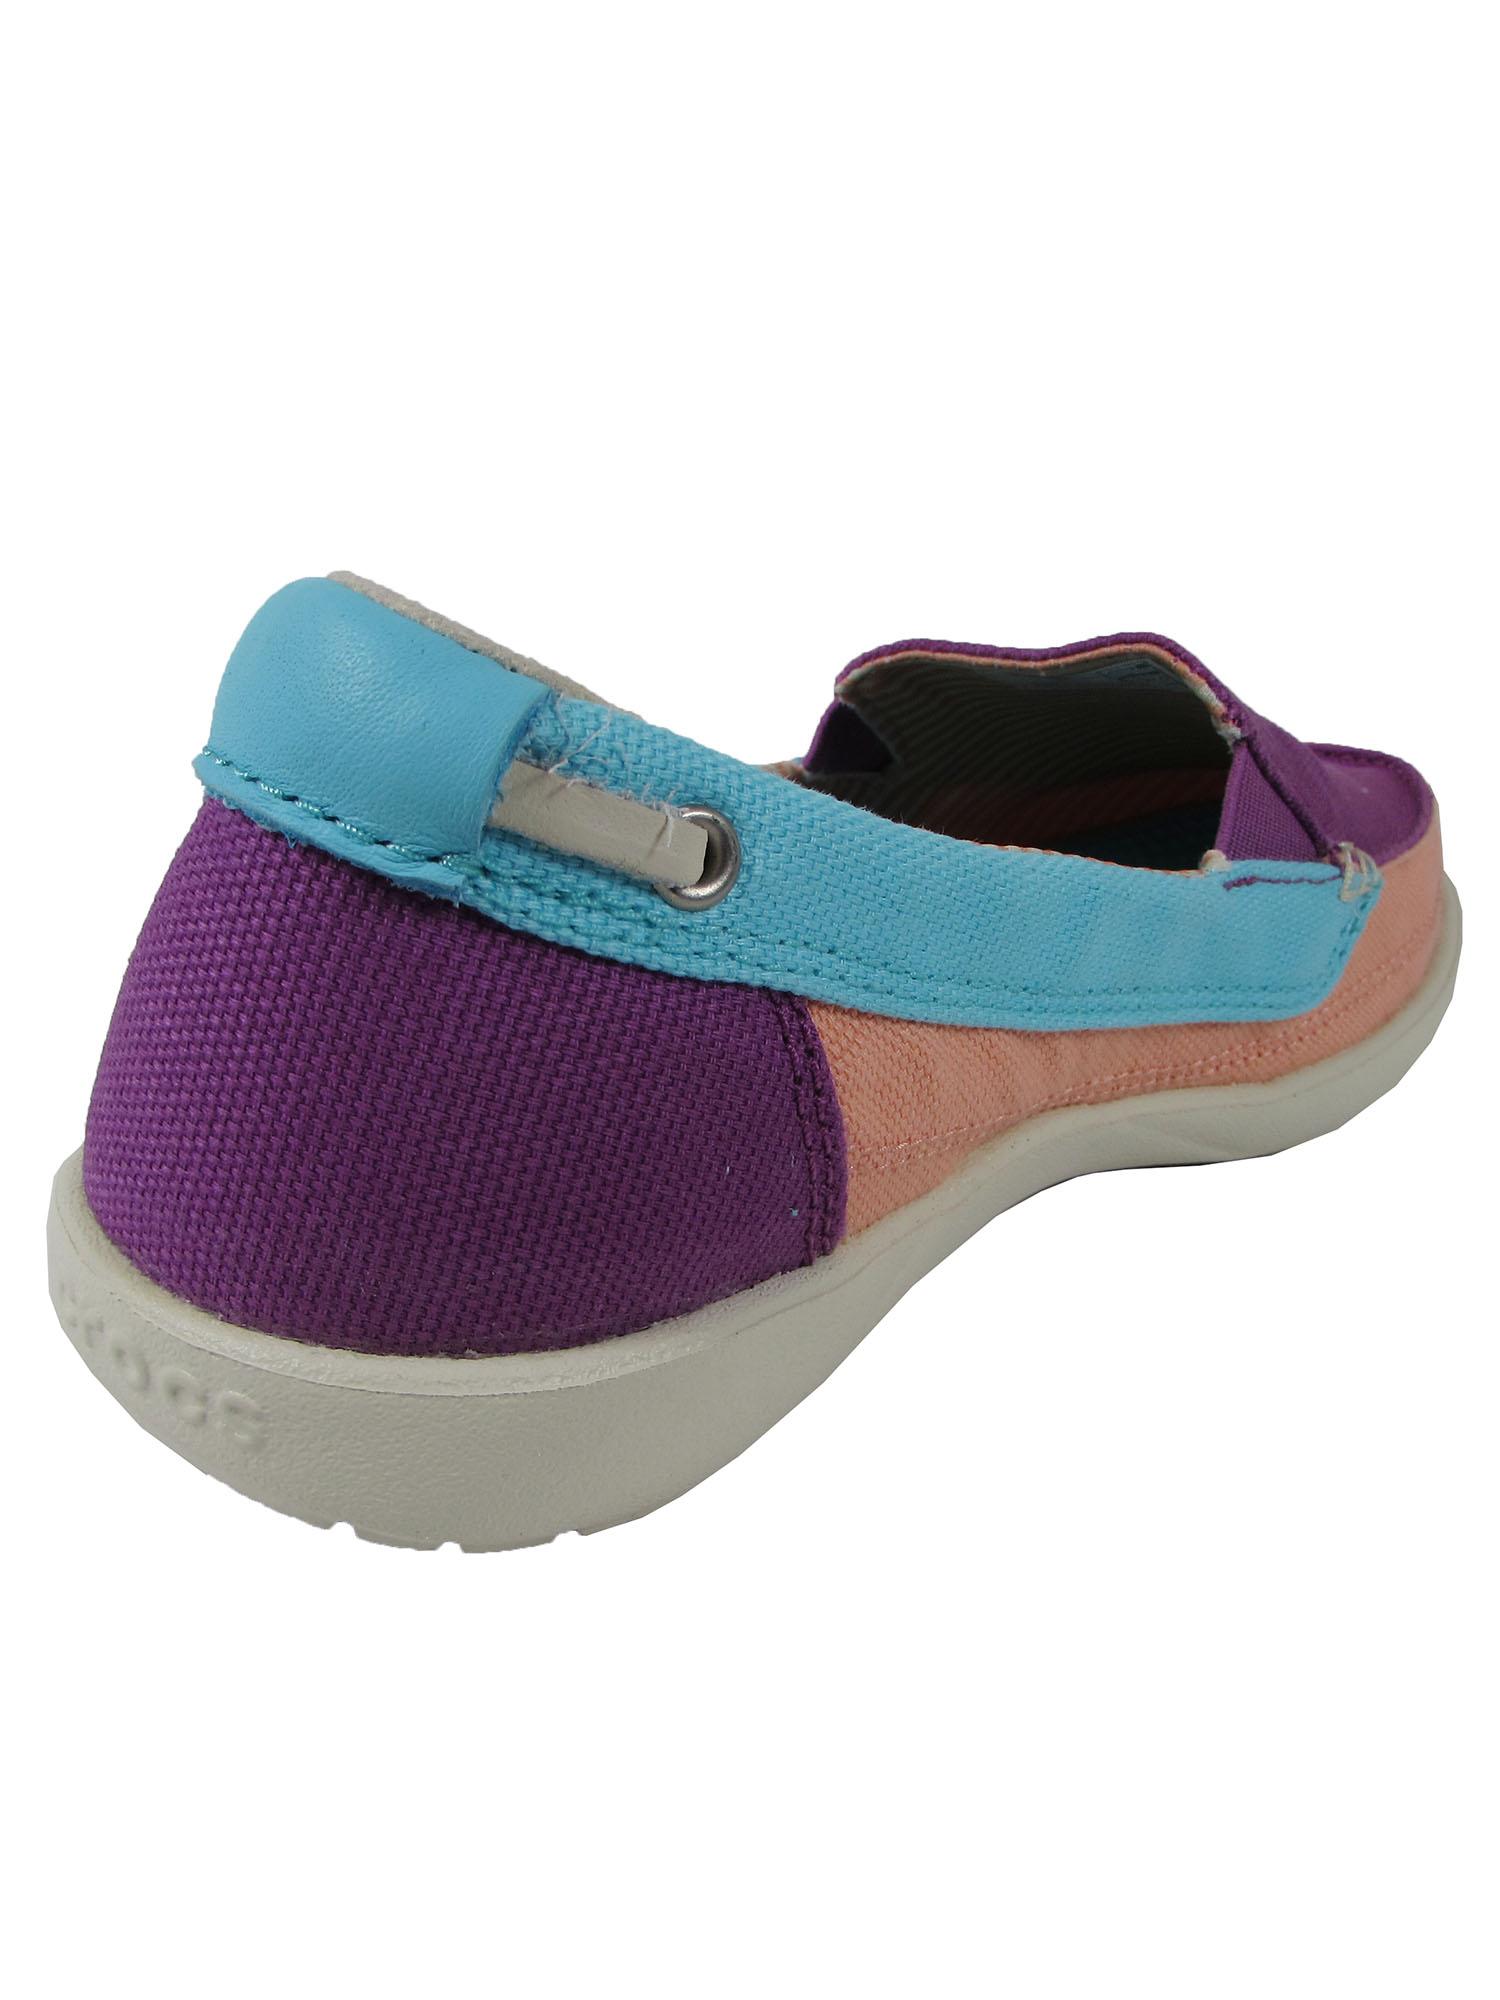 Crocs-Womens-Walu-Canvas-Loafer-Slip-On-Shoe thumbnail 19